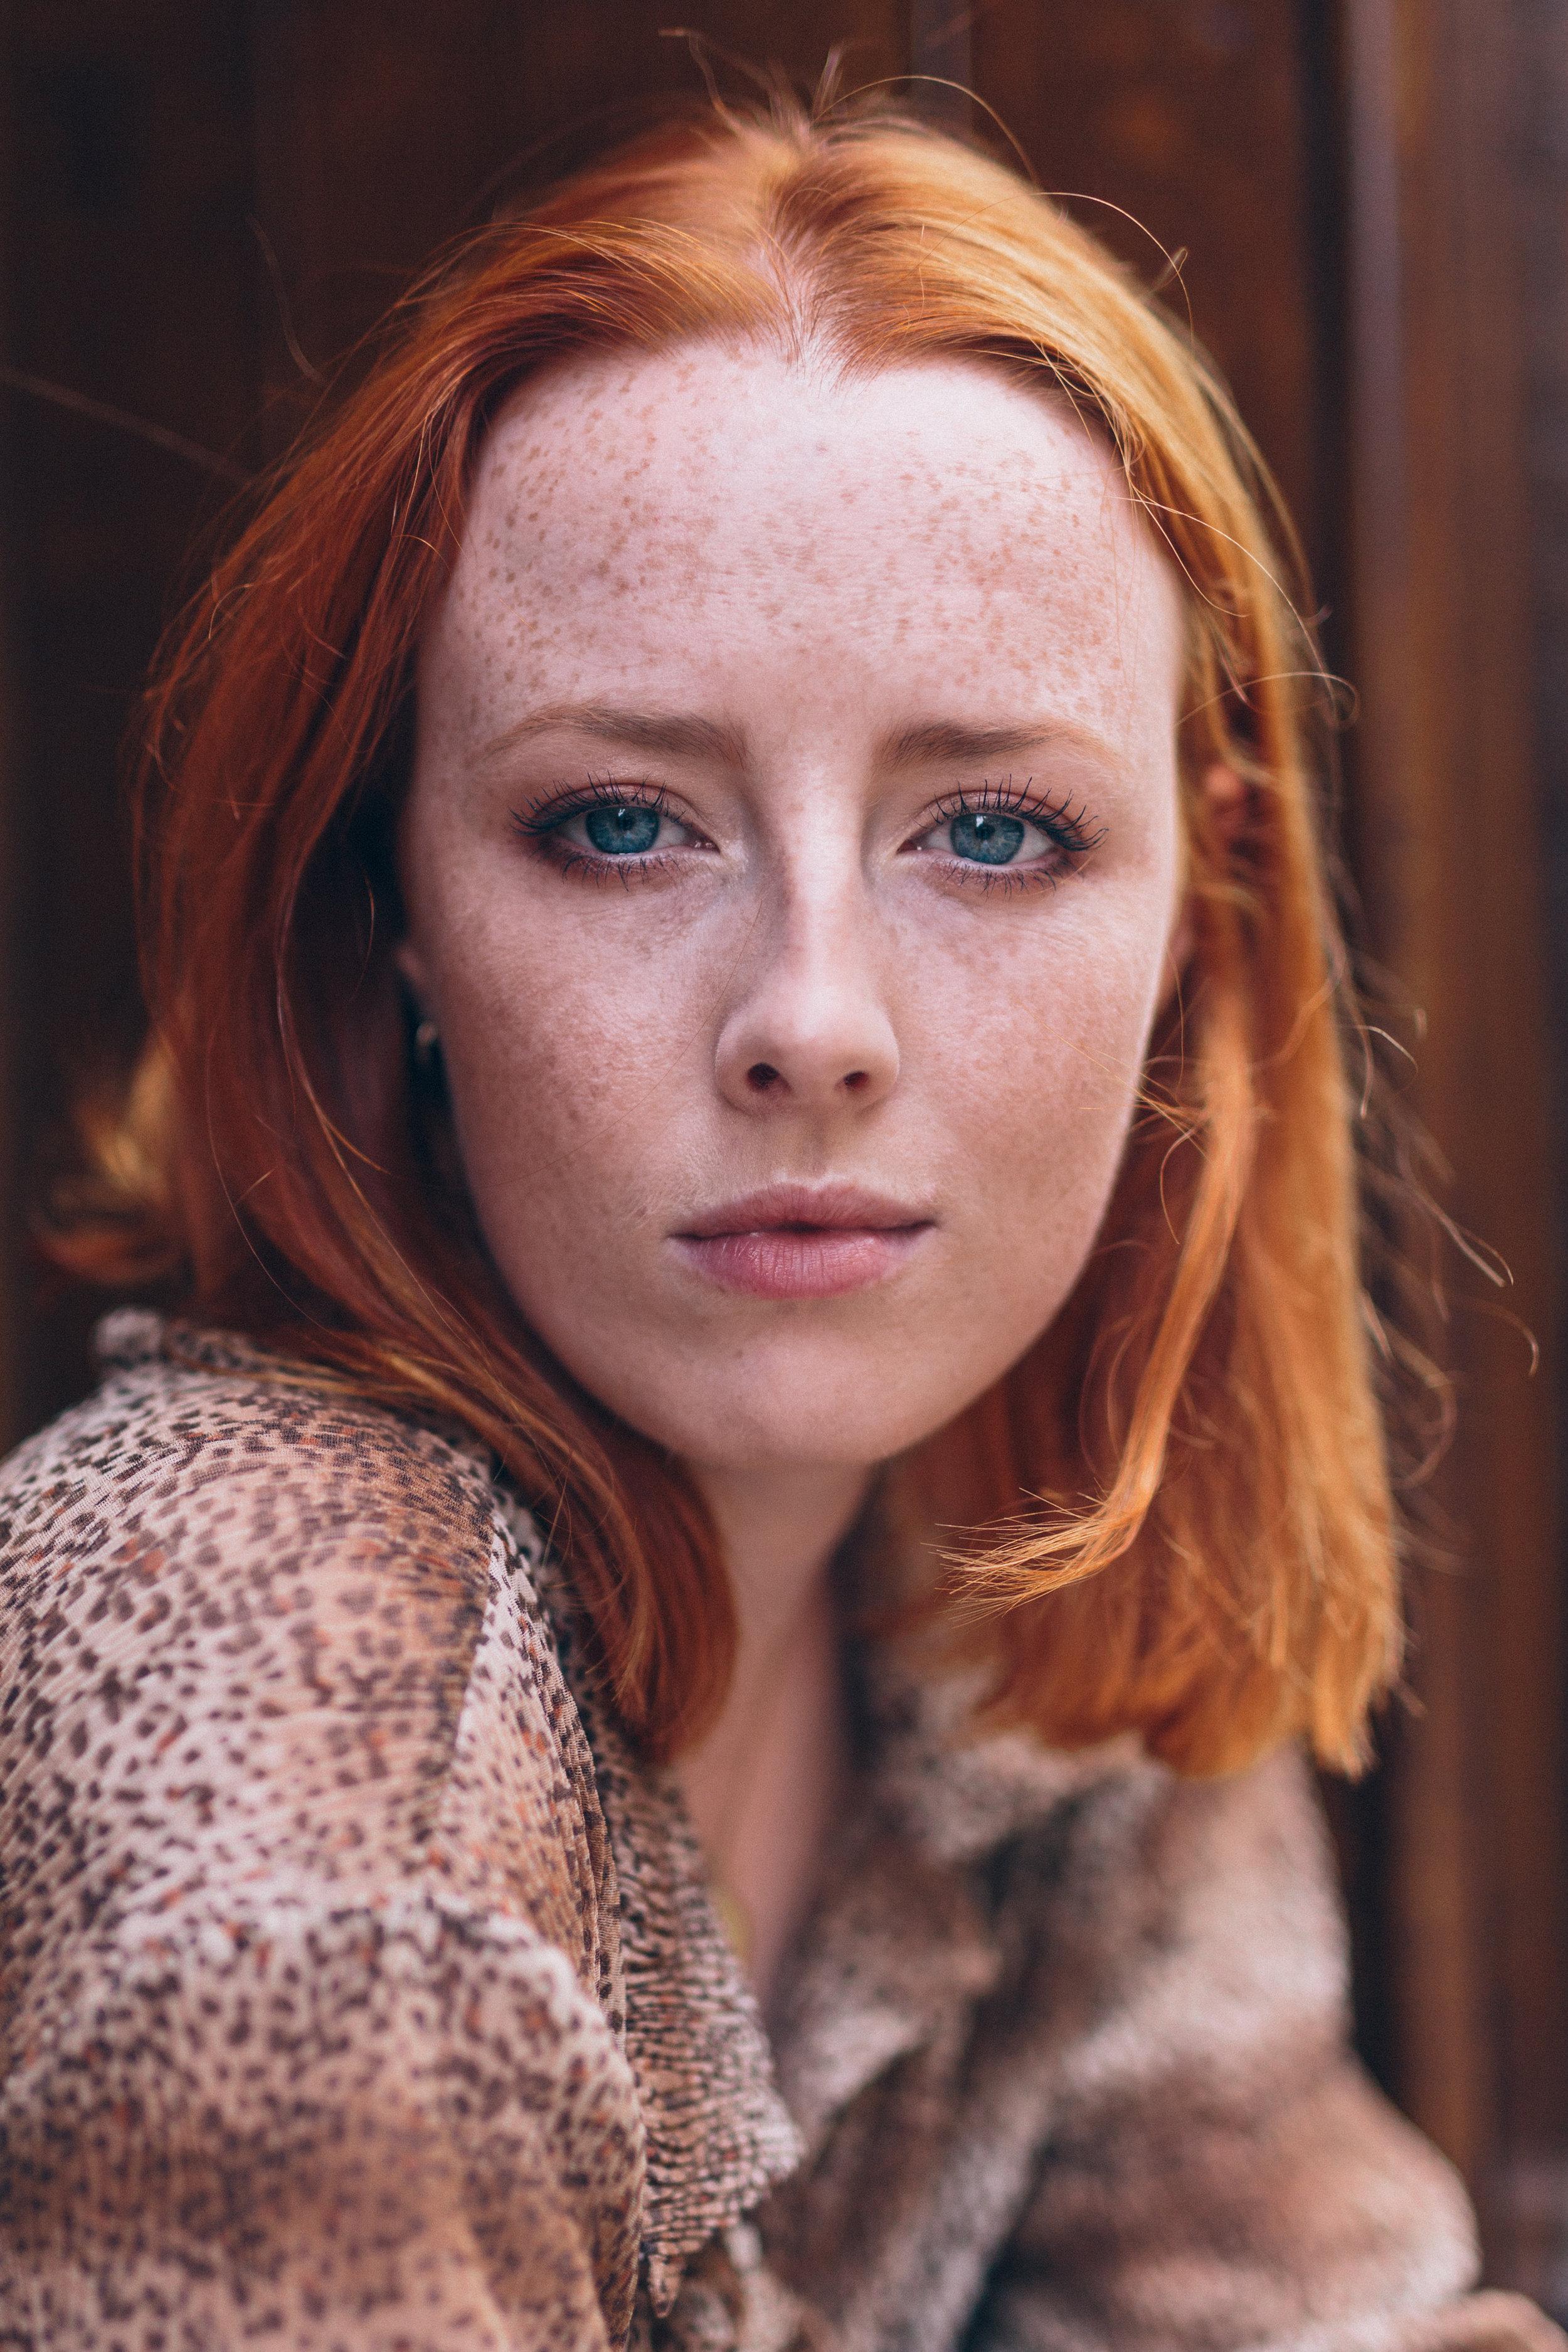 Katy_BrickLane-9.jpg